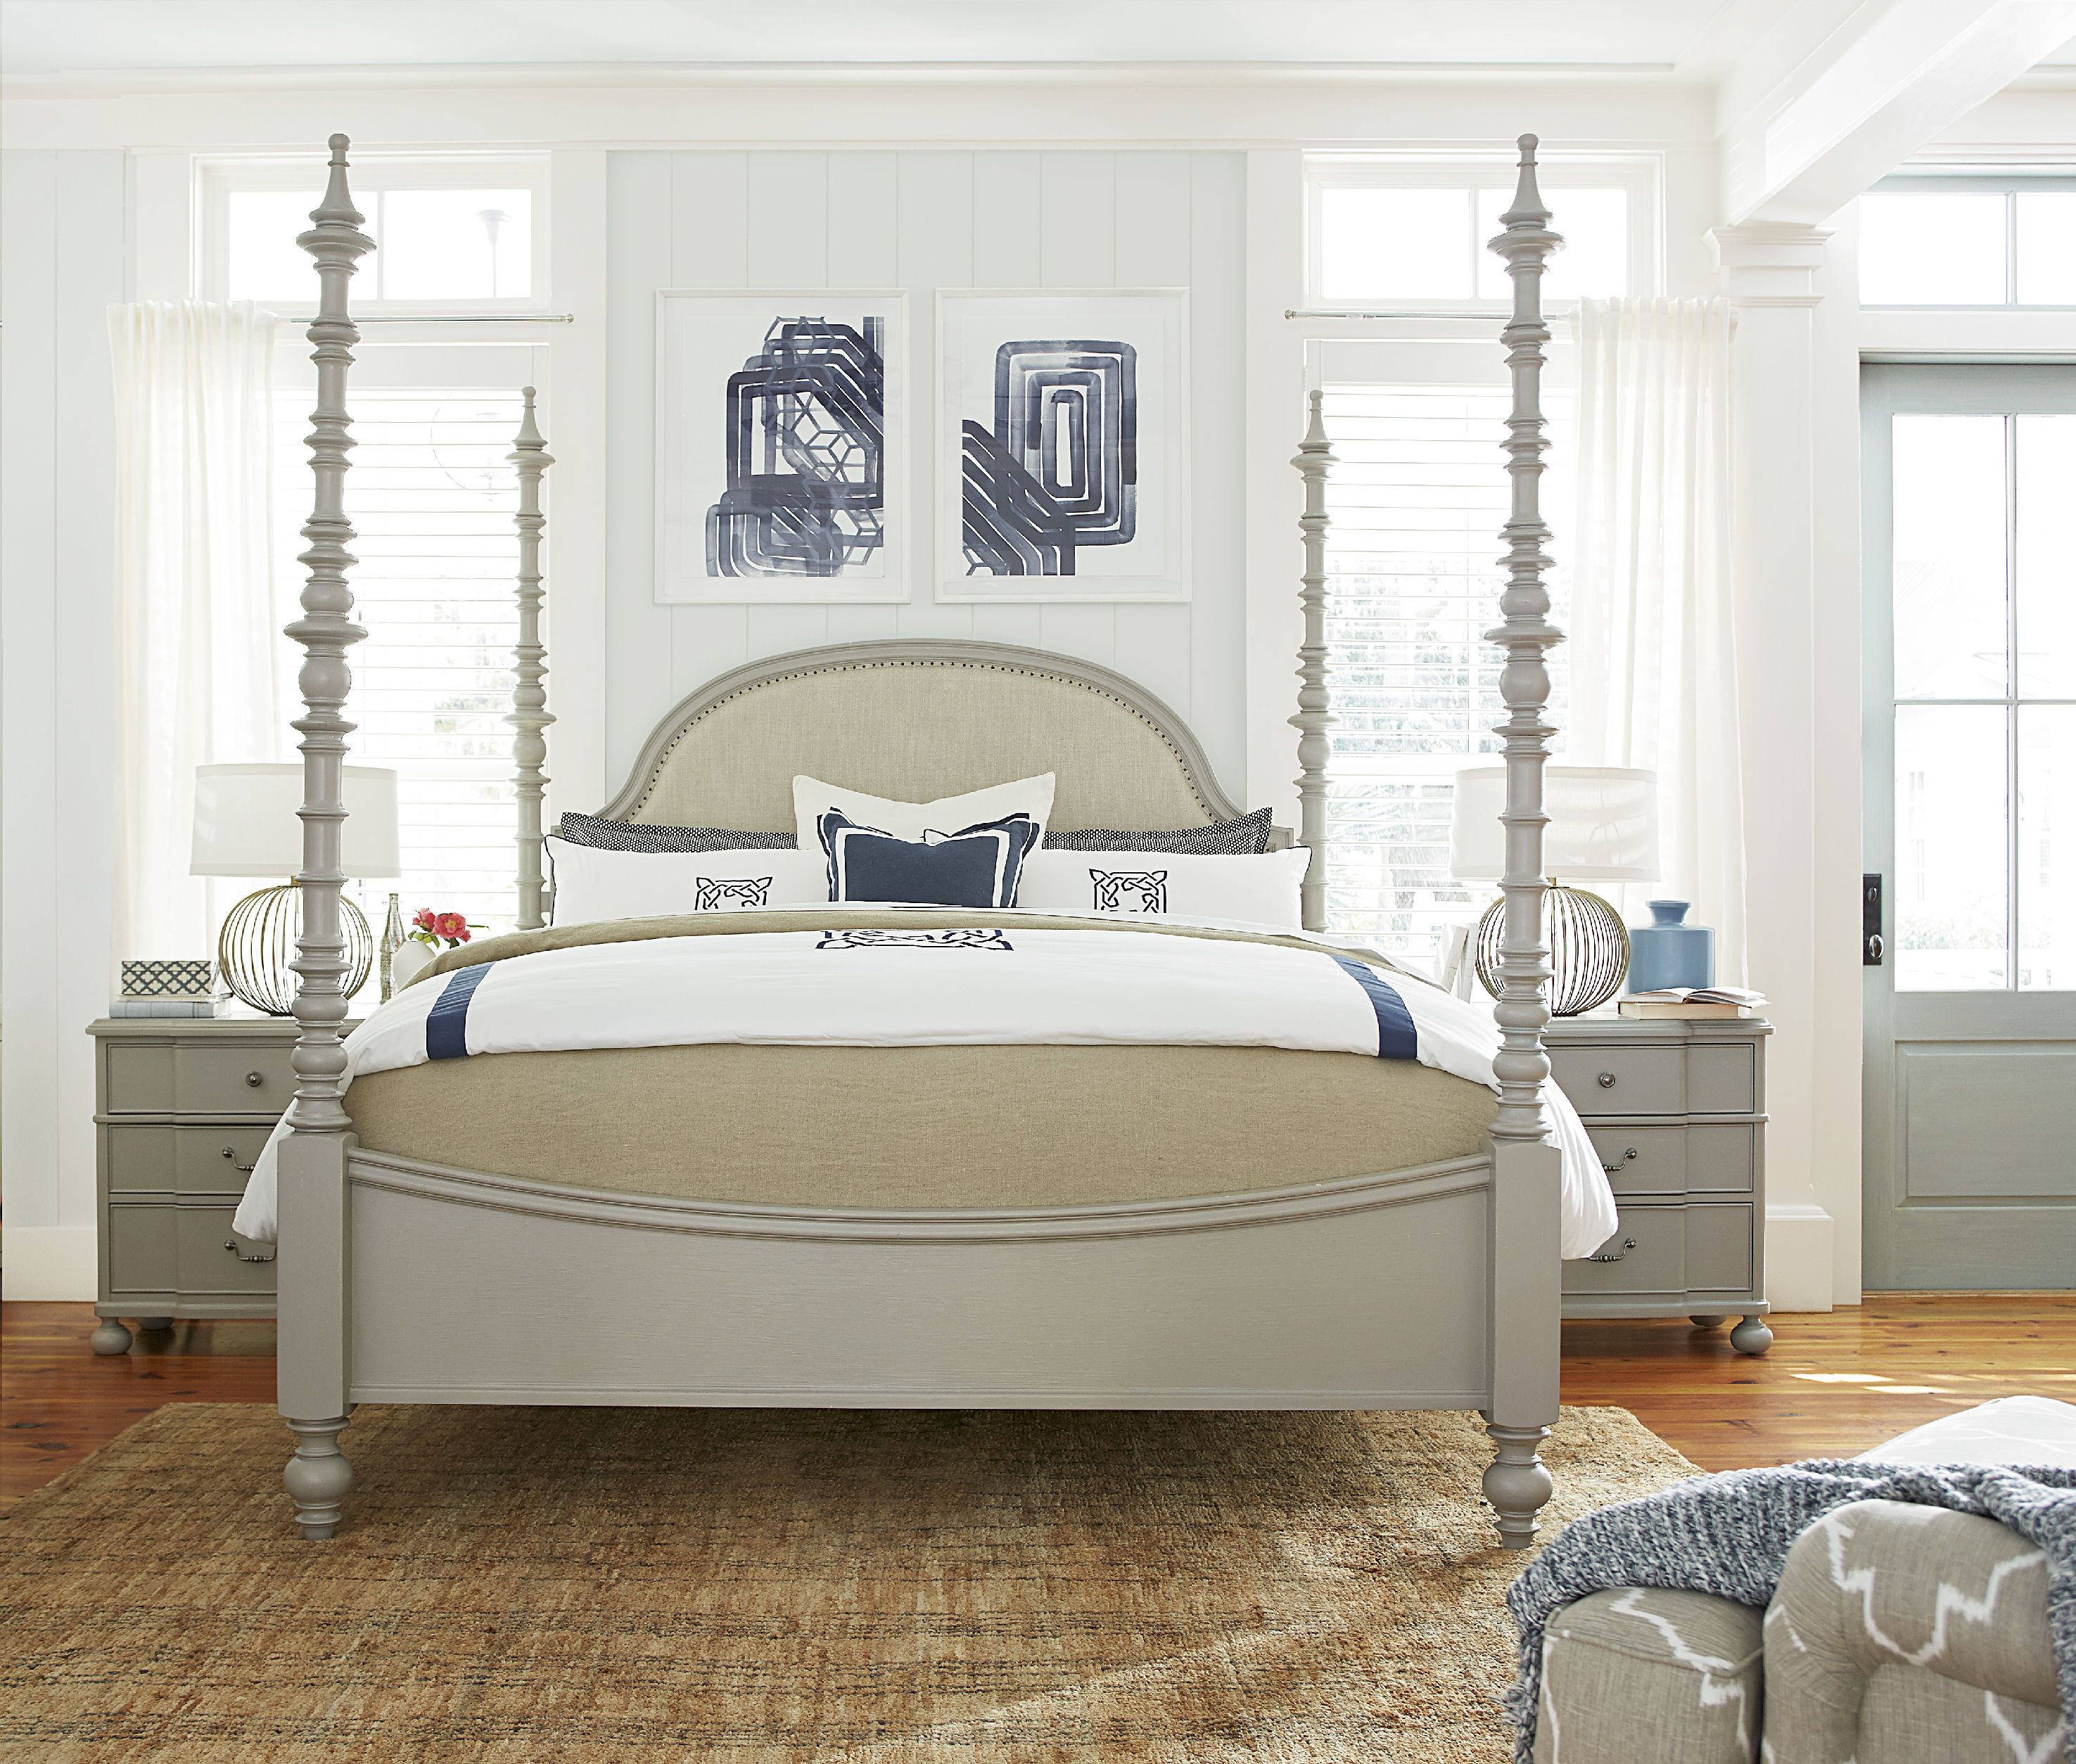 Ashley Furniture Beaumont Texas: Paula Deen By Universal Bedroom Dogwood Bed Queen 599280B